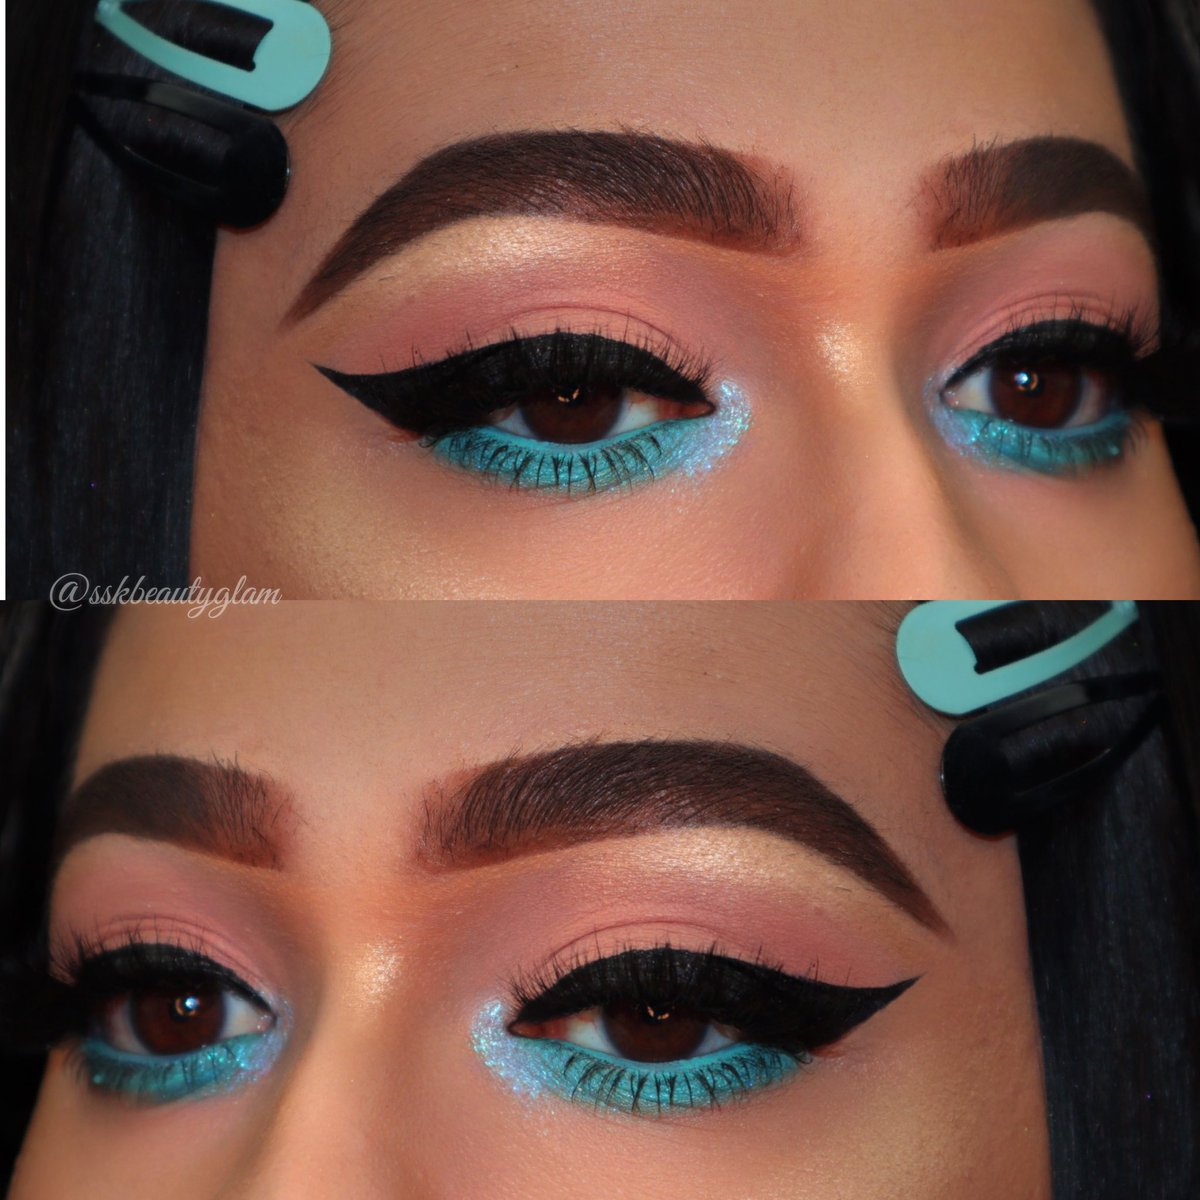 @ABHcosmetics Dipbrow Pomade, @ABHcosmetics Dipbrow Gel, @lagirlusa Shockwave neon eyeliner, @lagirlusa Glitterholic Topper #morphebabe #abhbrows #AnastasiaBeverlyHills #THELIST #lagirlcosmetics #glitter #makeuplooks #makeupaddict #makeuplover #makeup #norvina #mua #bloggerspic.twitter.com/tneukIJFfQ